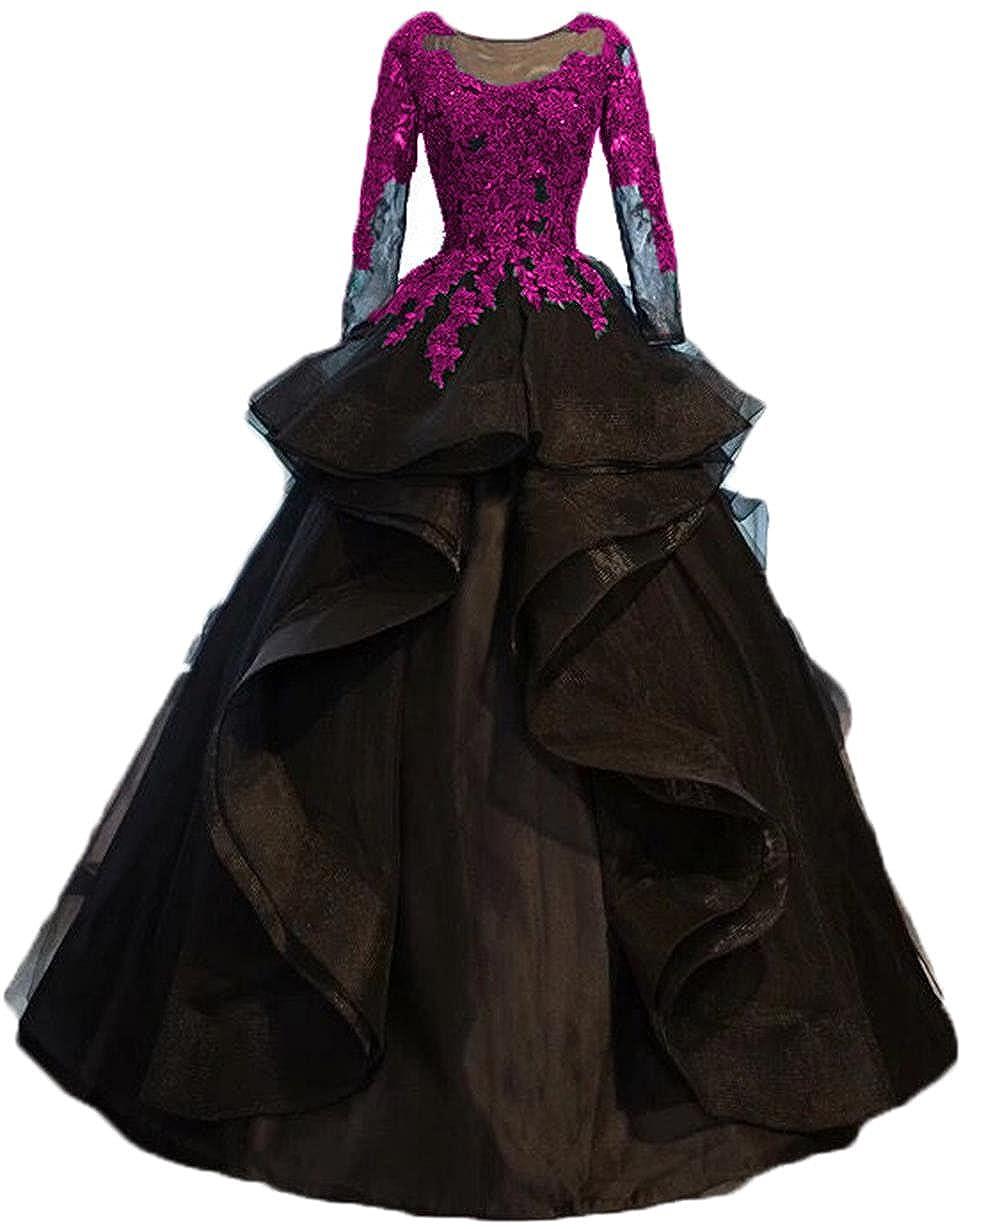 Hot Pink Dydsz Evening Party Dresses for Women Wedding Long Sleeve Formal Dress Ball Gown D264